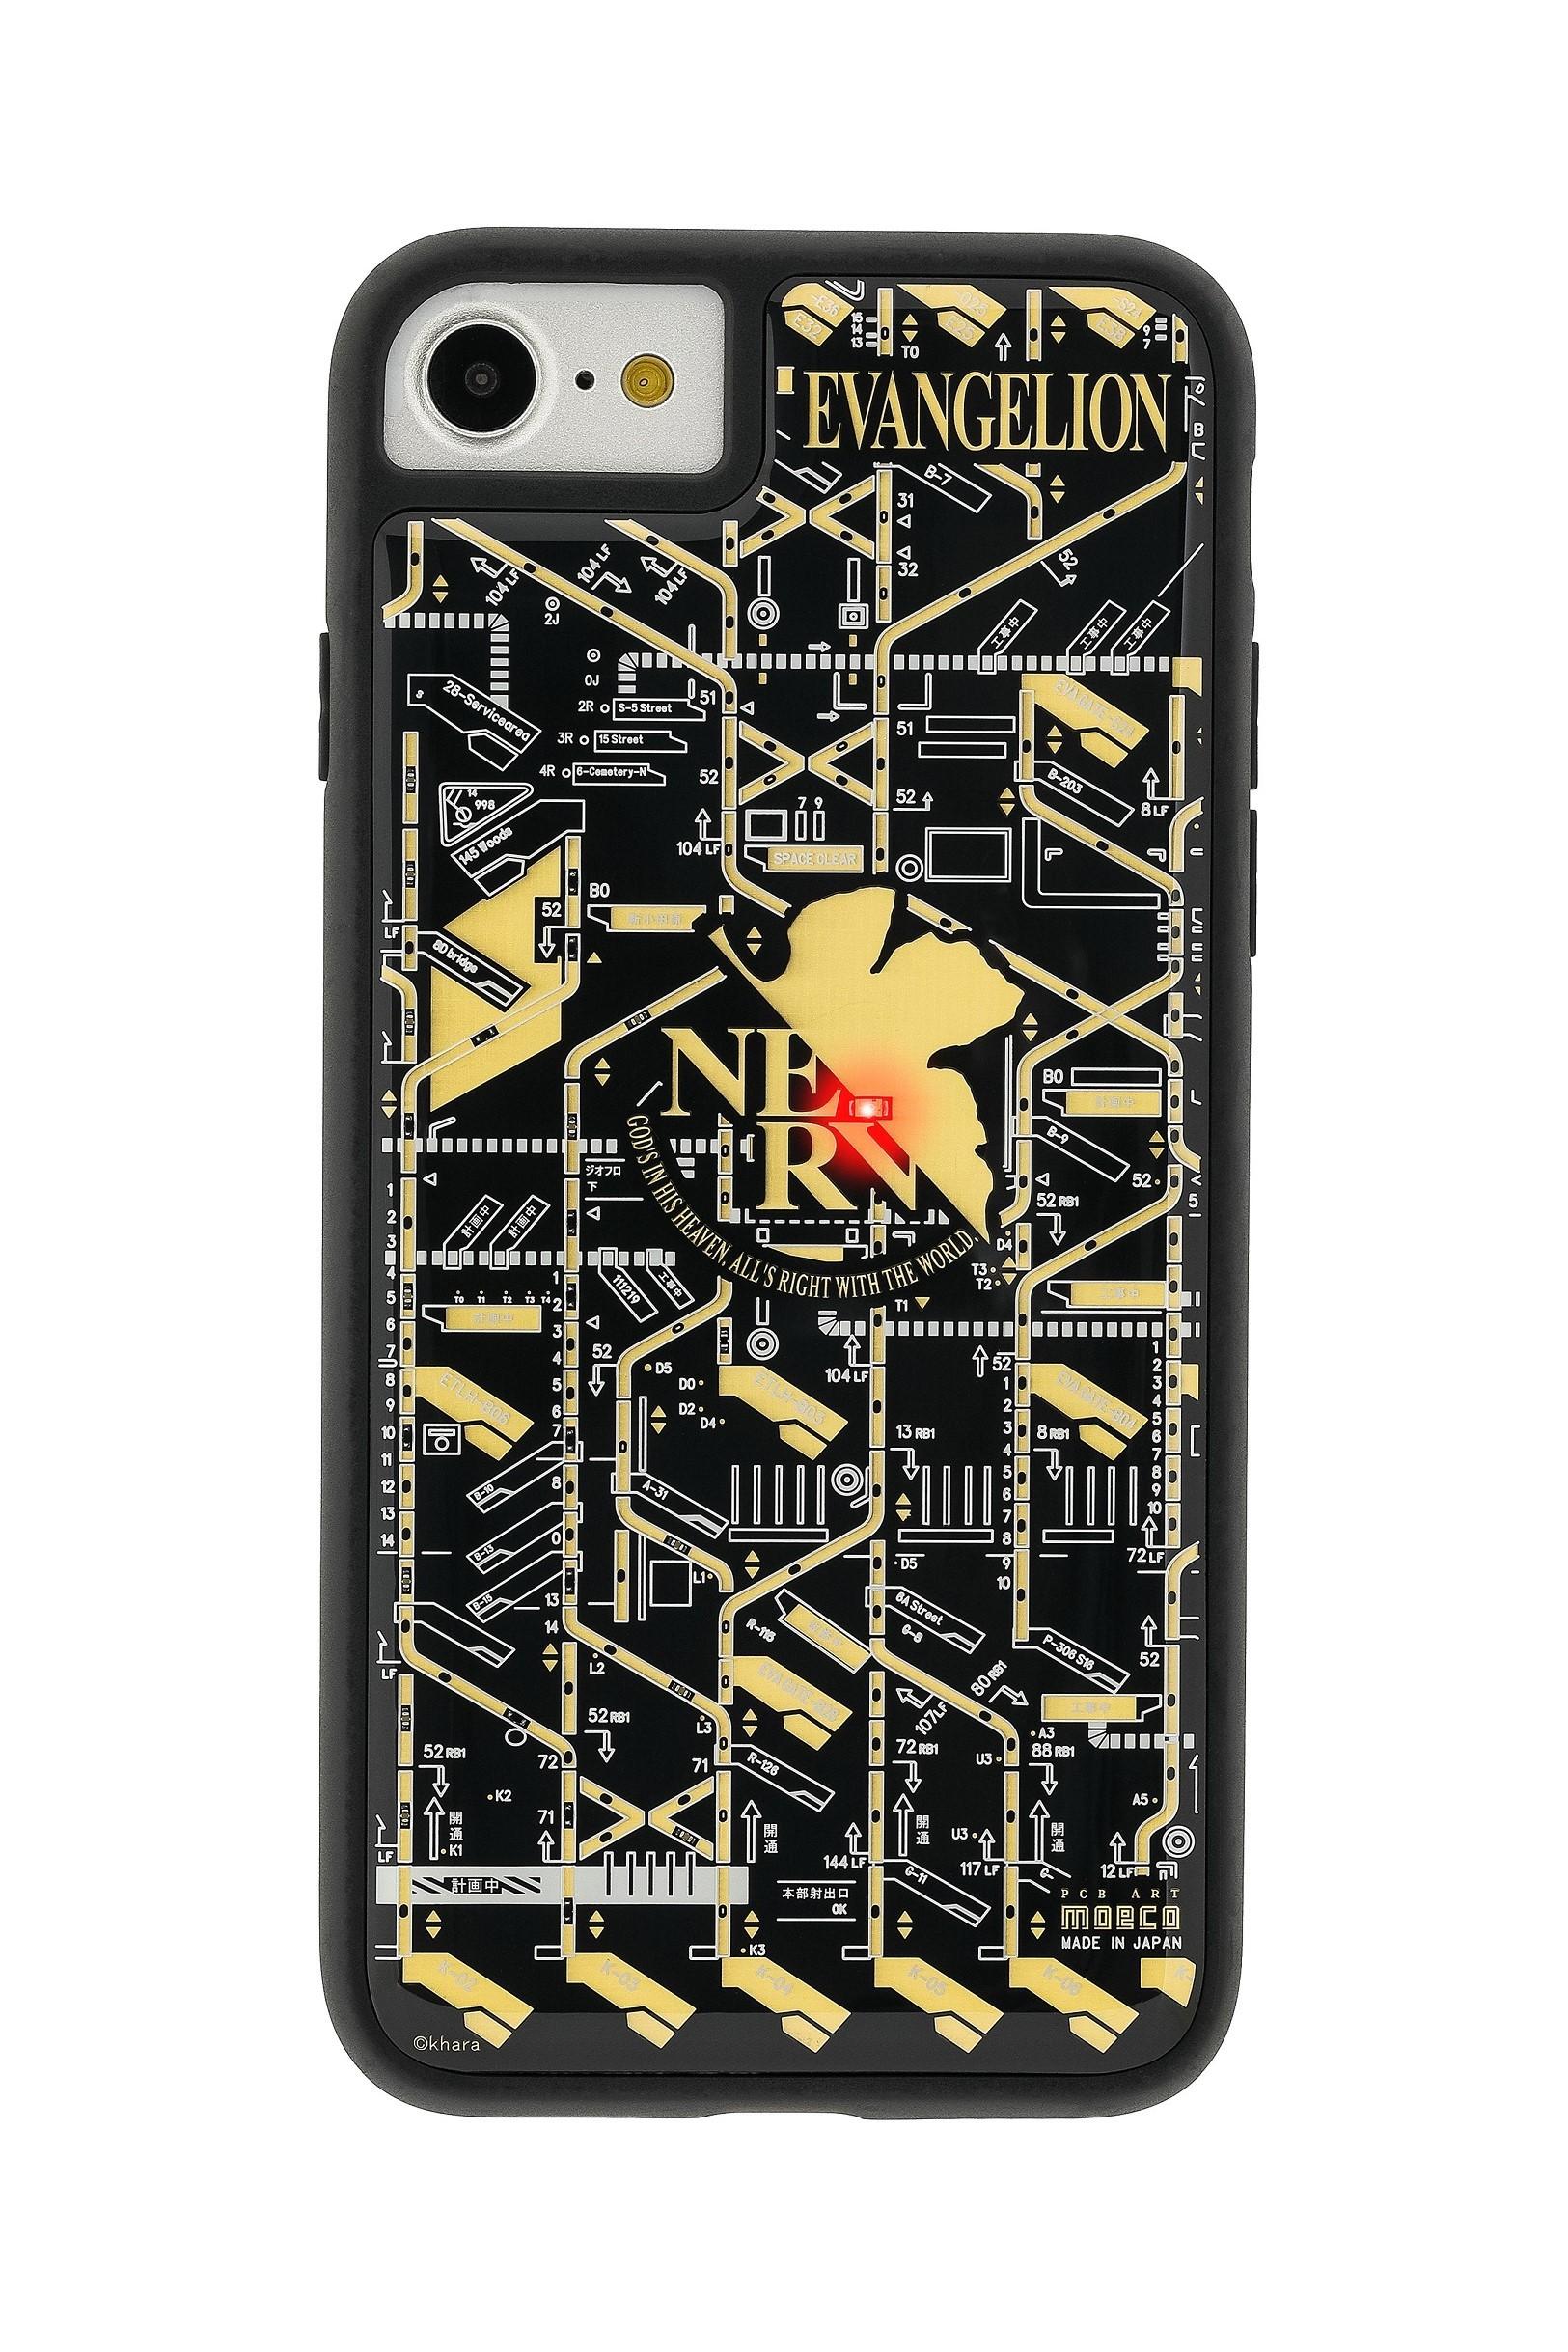 FLASH NERV 基板アート iPhoneSE(第2世代)/7/8ケース 黒【東京回路線図A5クリアファイルをプレゼント】